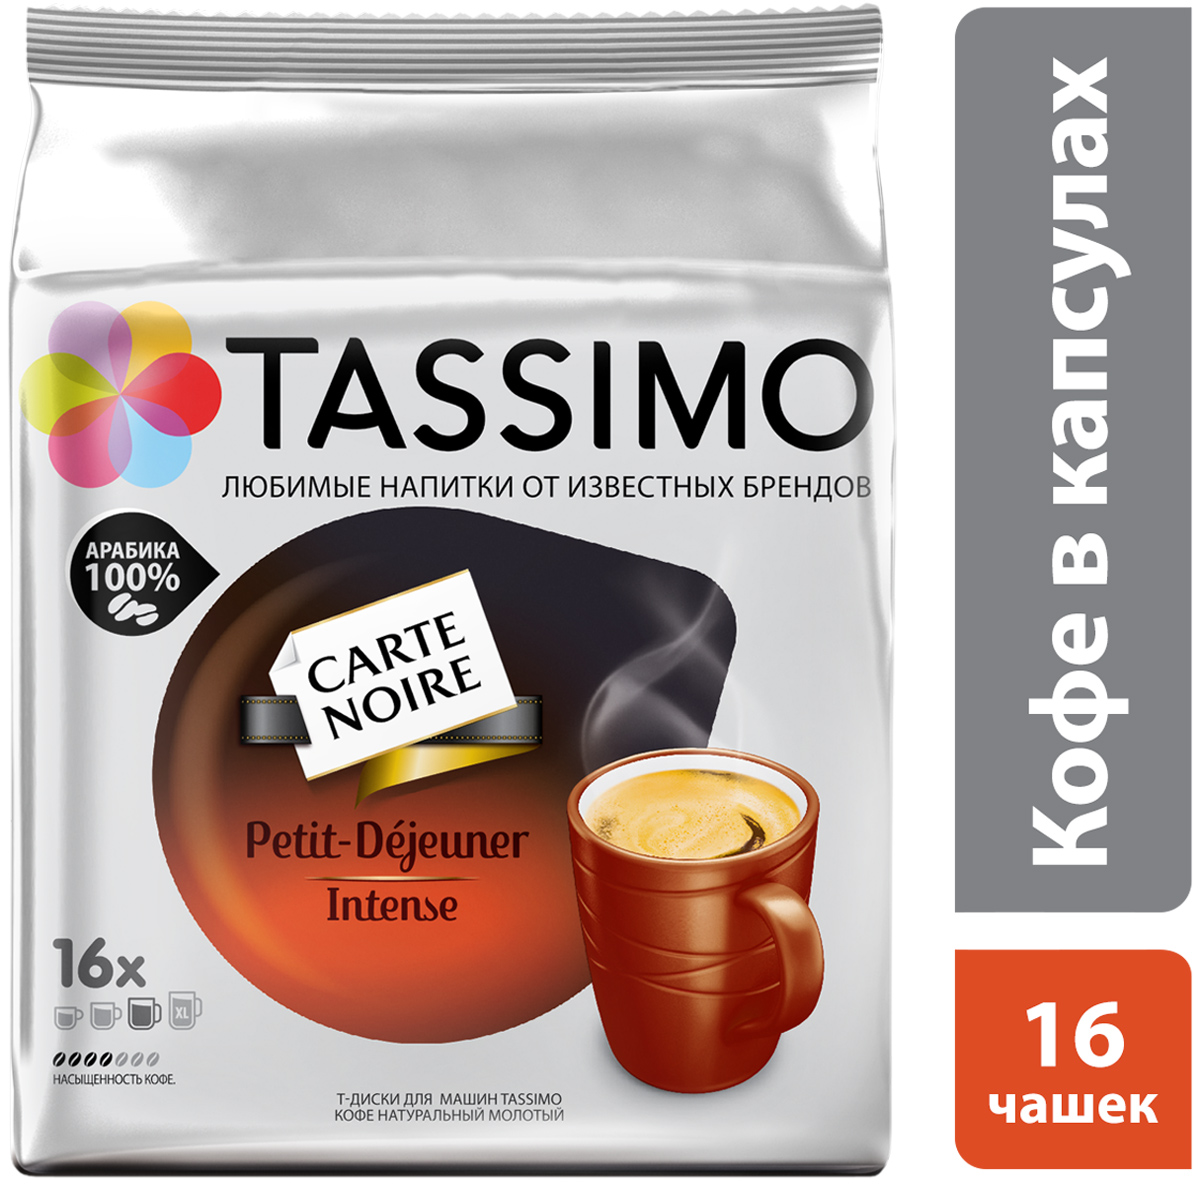 Tassimo Carte Noire Petit-Dejeuner Intense кофе в капсулах, 16 шт tassimo jacobs espresso classico кофе в капсулах 16 шт